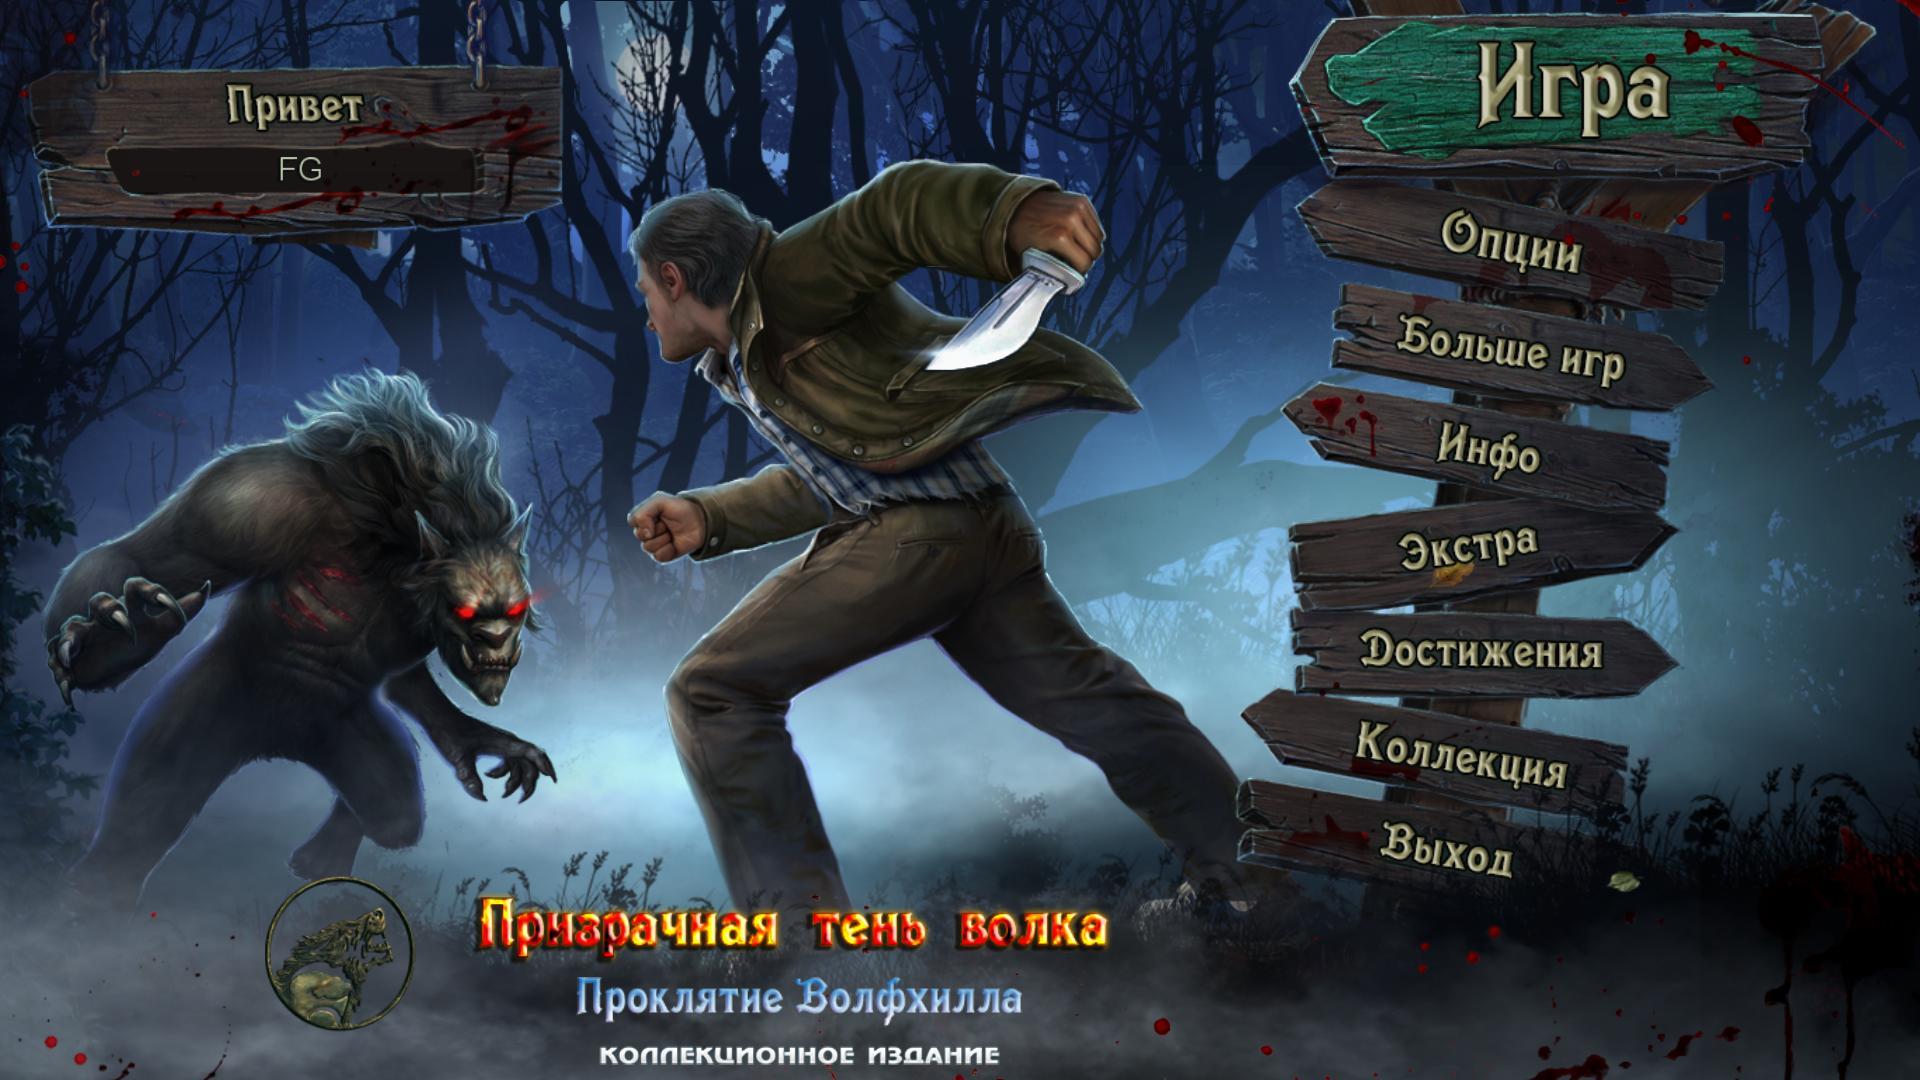 Призрачная тень волка 6: Проклятие Волфхилла. Коллекционное издание | Shadow Wolf Mysteries 6: Curse of Wolfhill CE (Rus)